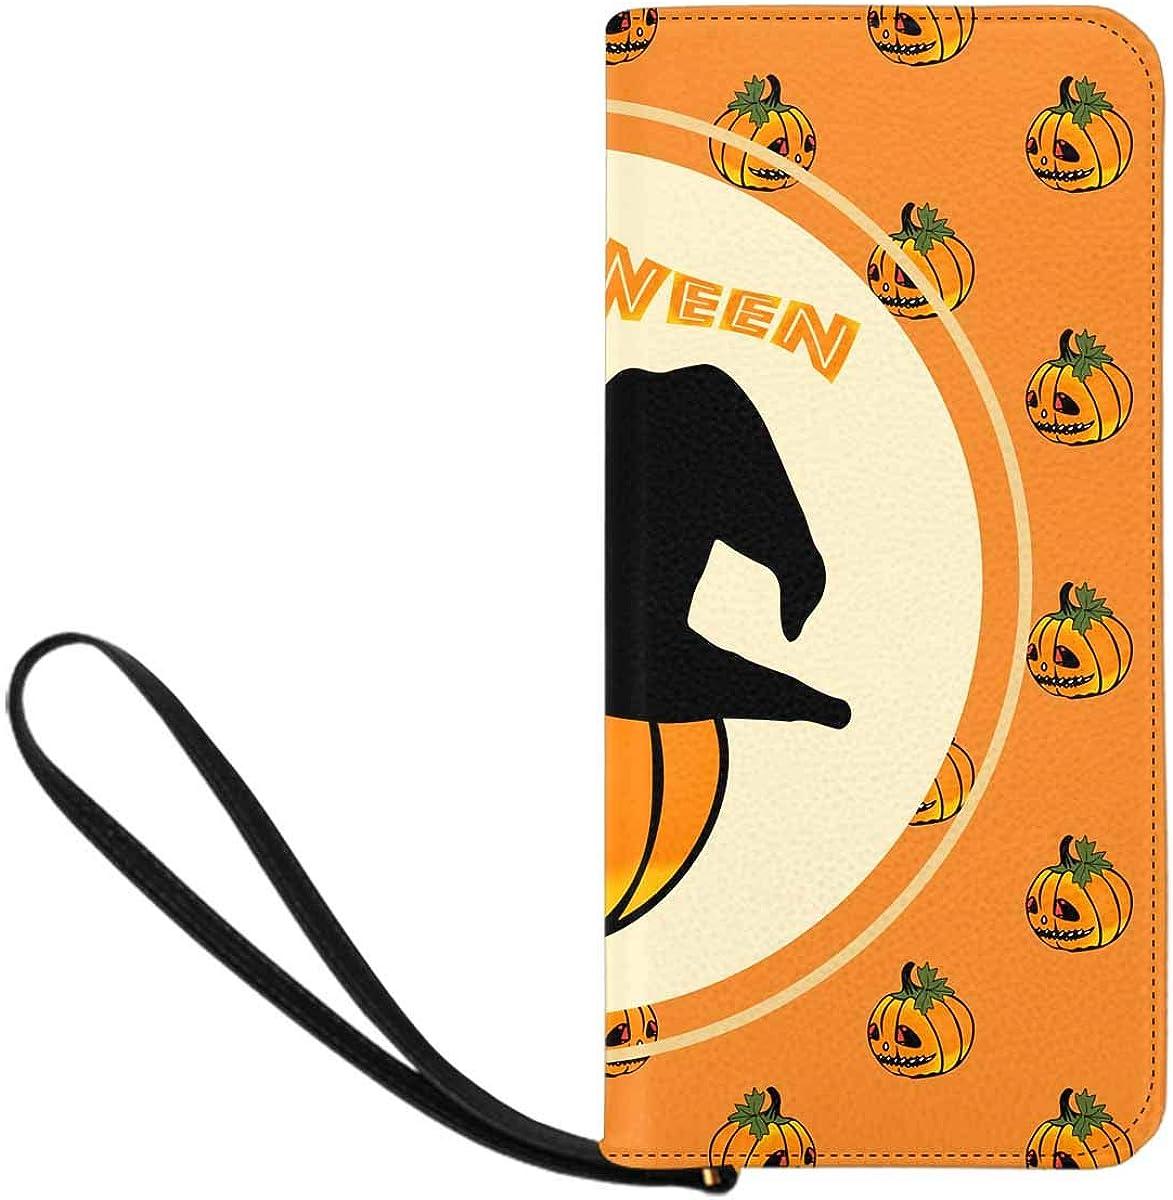 INTERESTPRINT Halloween Pumpkin Head Clutch Wallet Handbag for Party Wedding